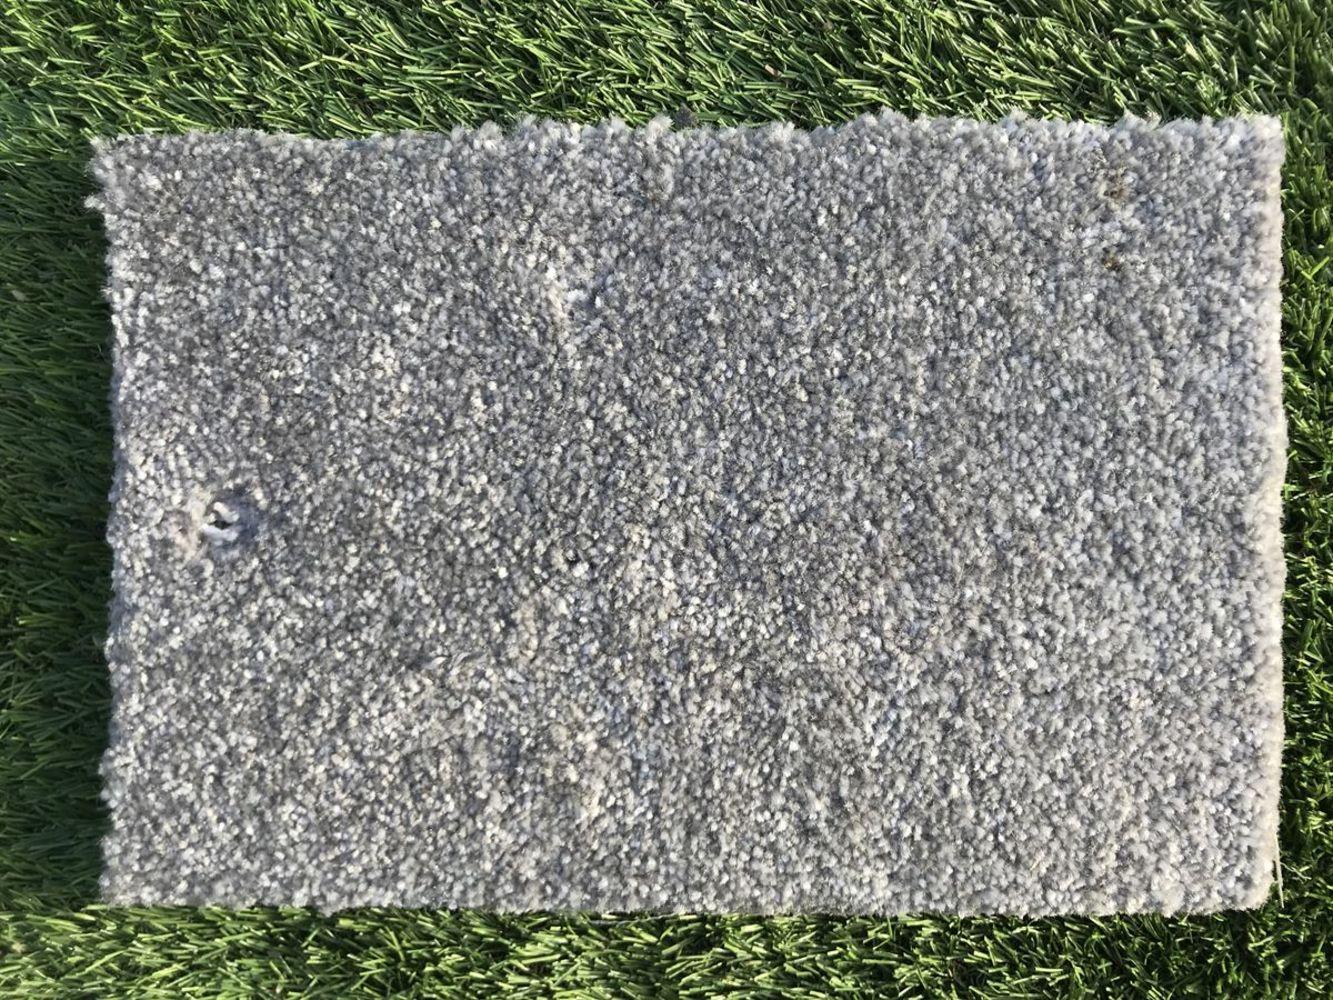 High Quality Carpet & Underlay   No VAT on Hammer   Free Shipping to Mainland UK